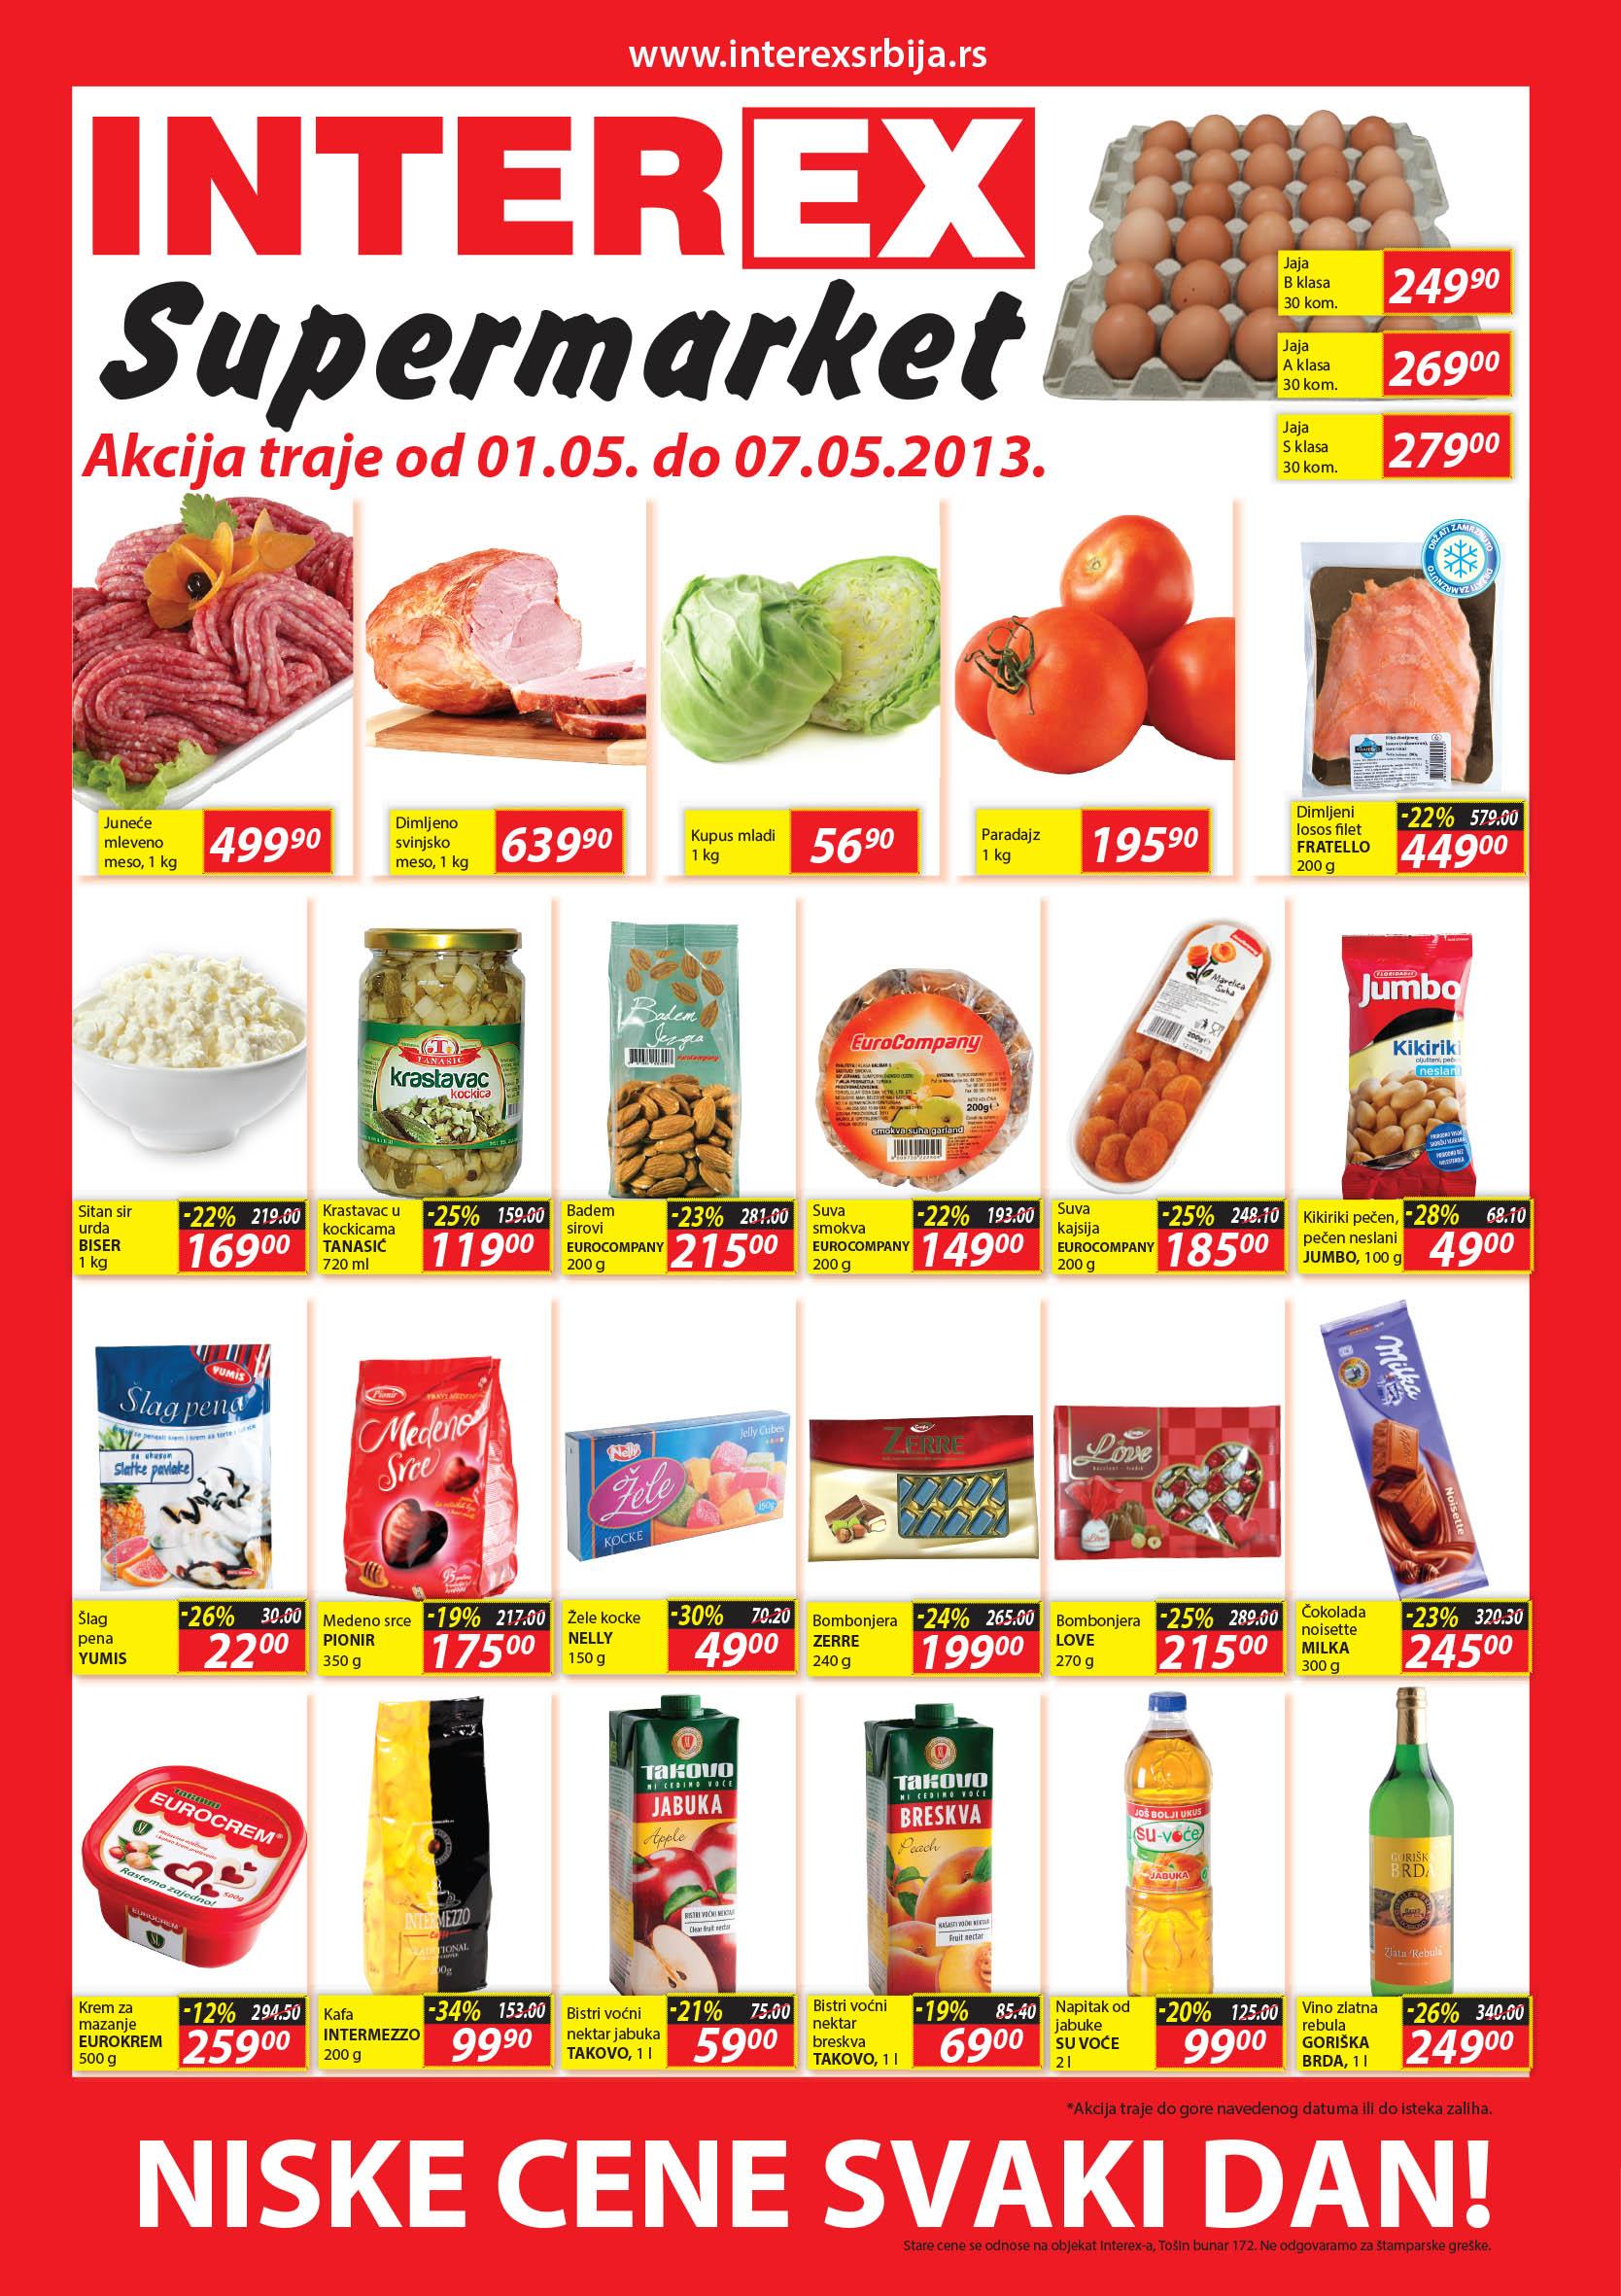 Interex Katalog Niske cene